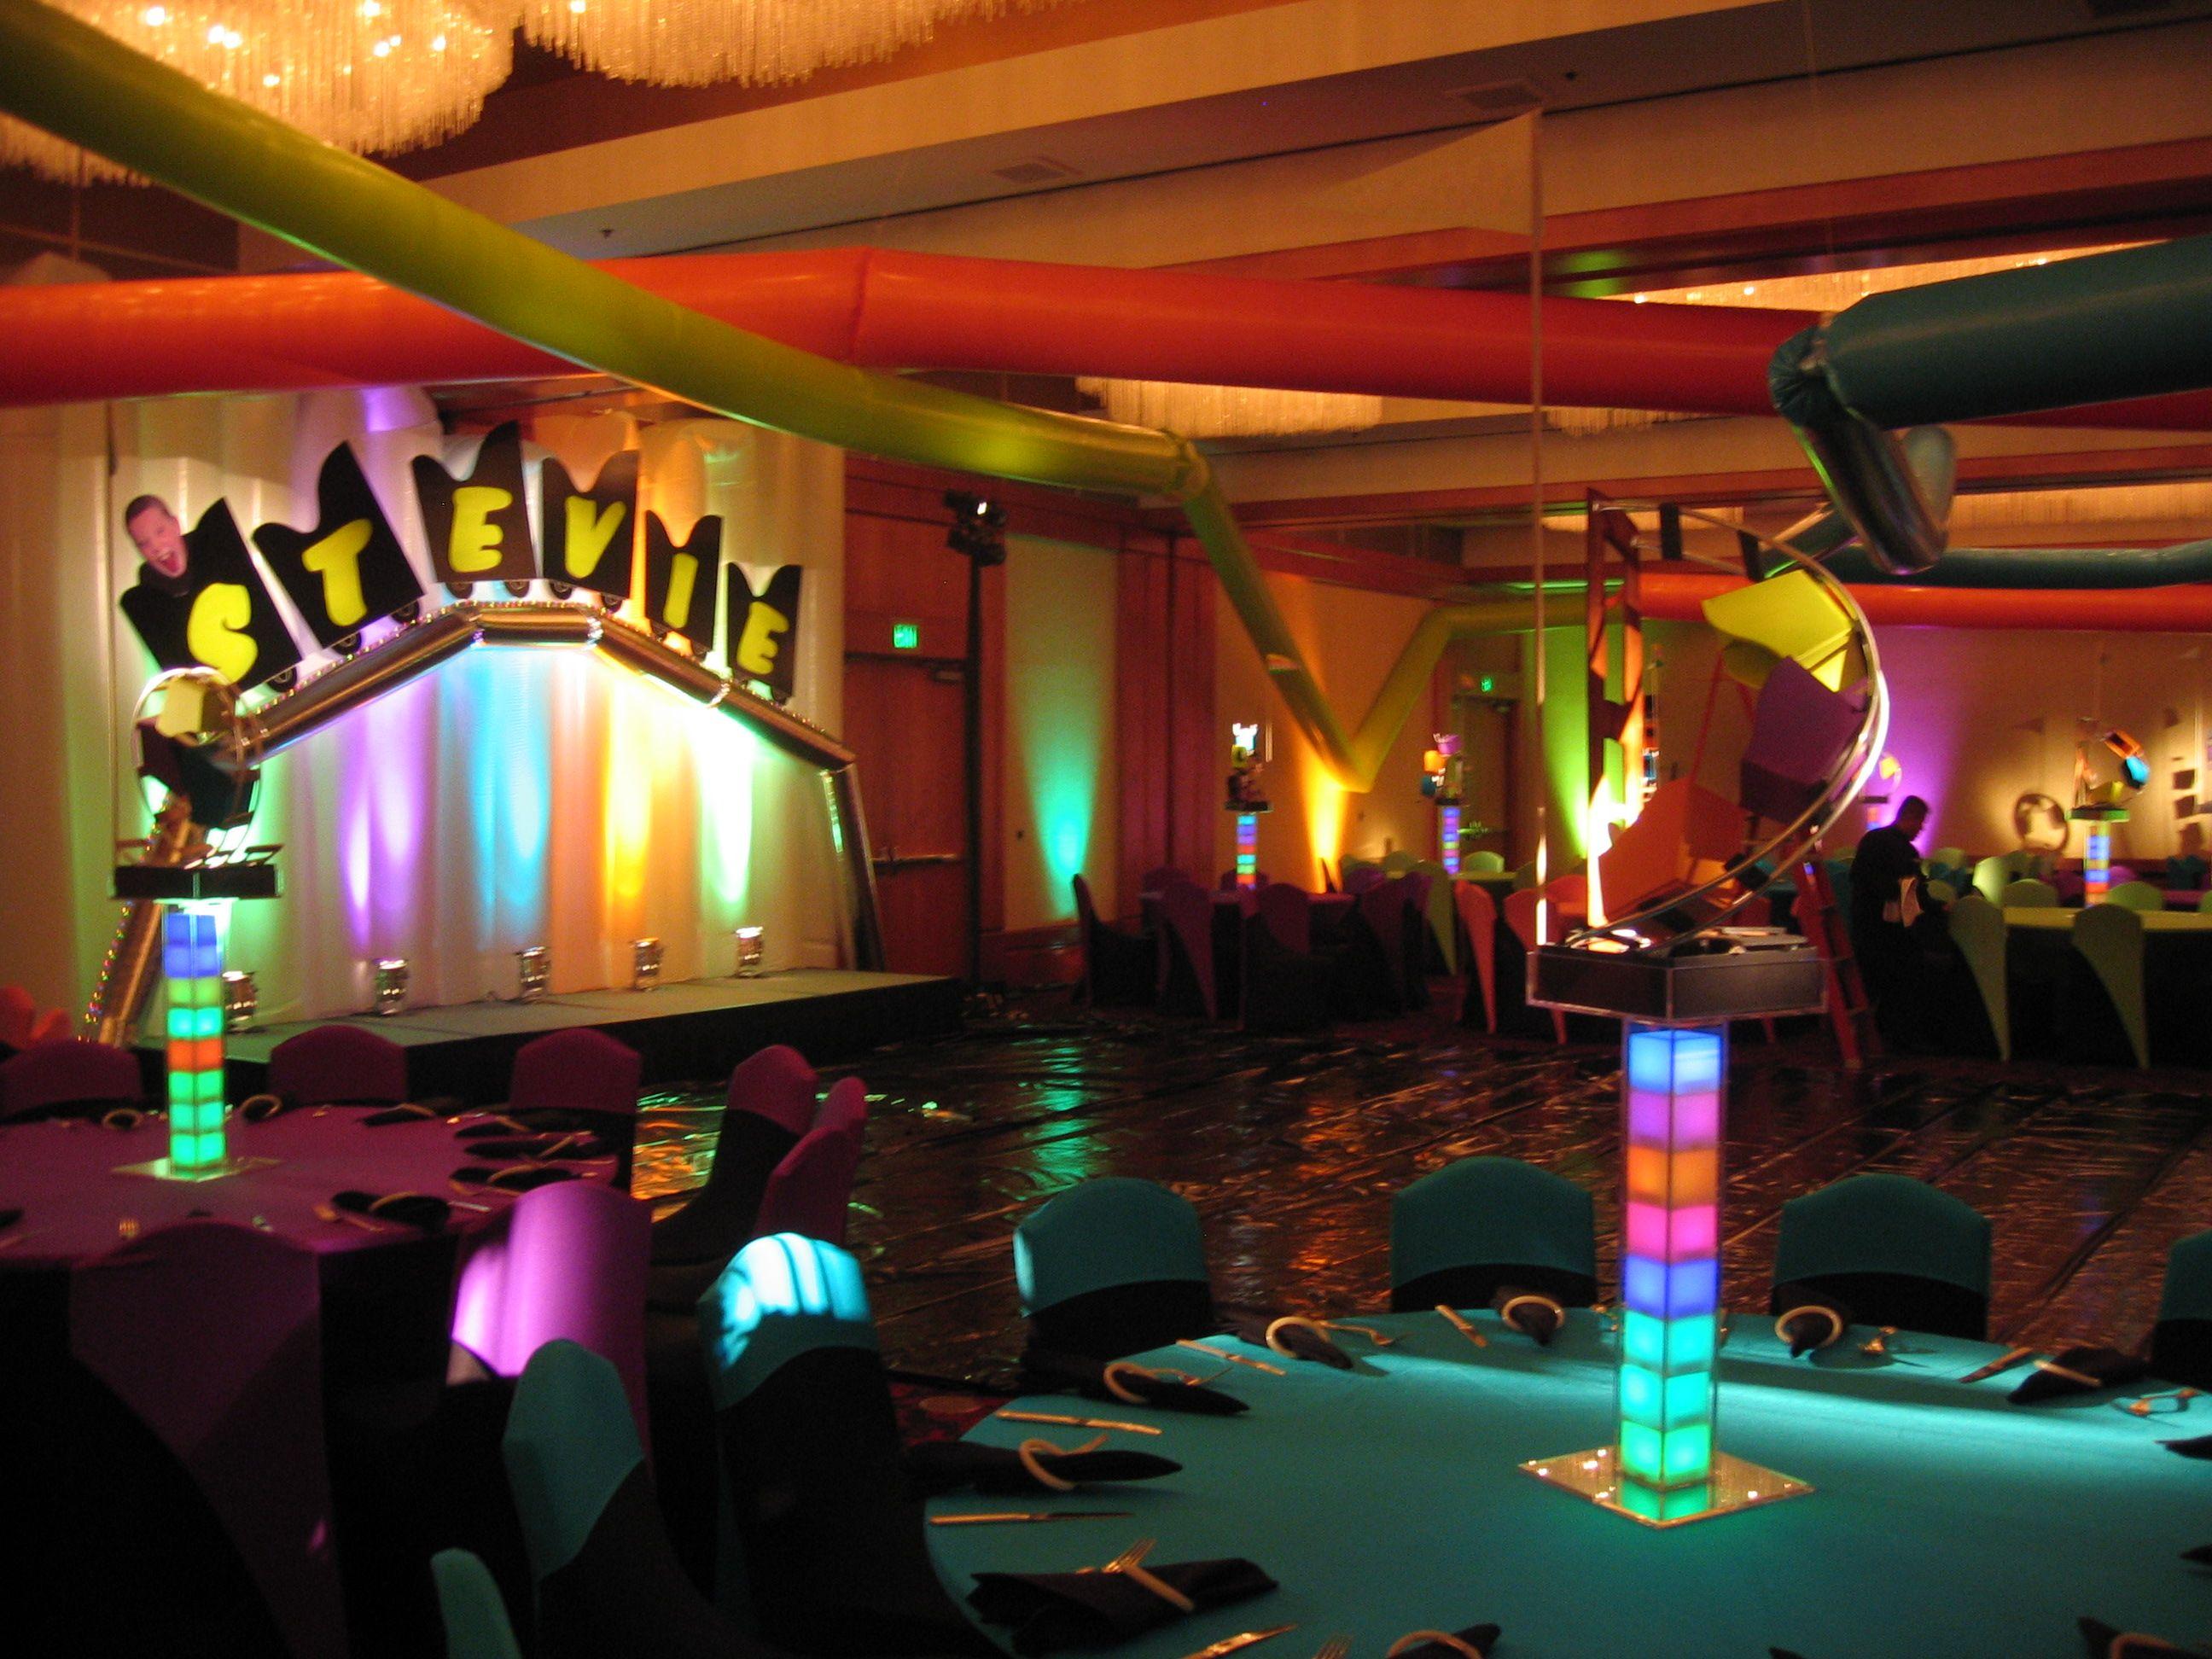 Bar Mitzvah Roller Coaster Theme Room